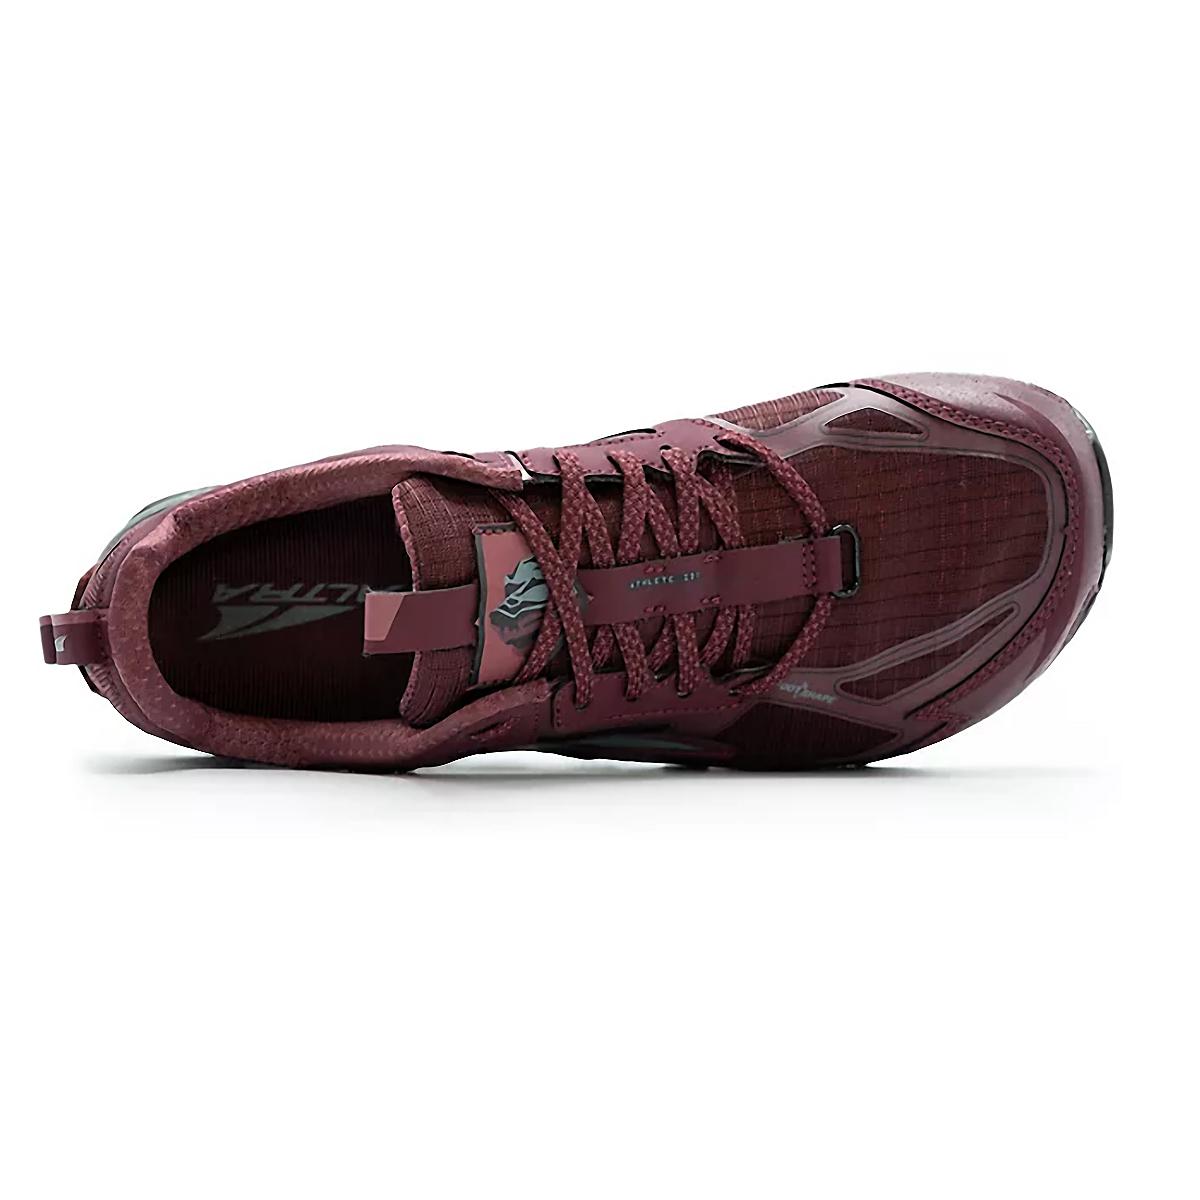 Women's Altra Lone Peak 4.5 Low Trail Running Shoe - Color: Dark Port - Size: 5.5 - Width: Regular, Dark Port, large, image 3